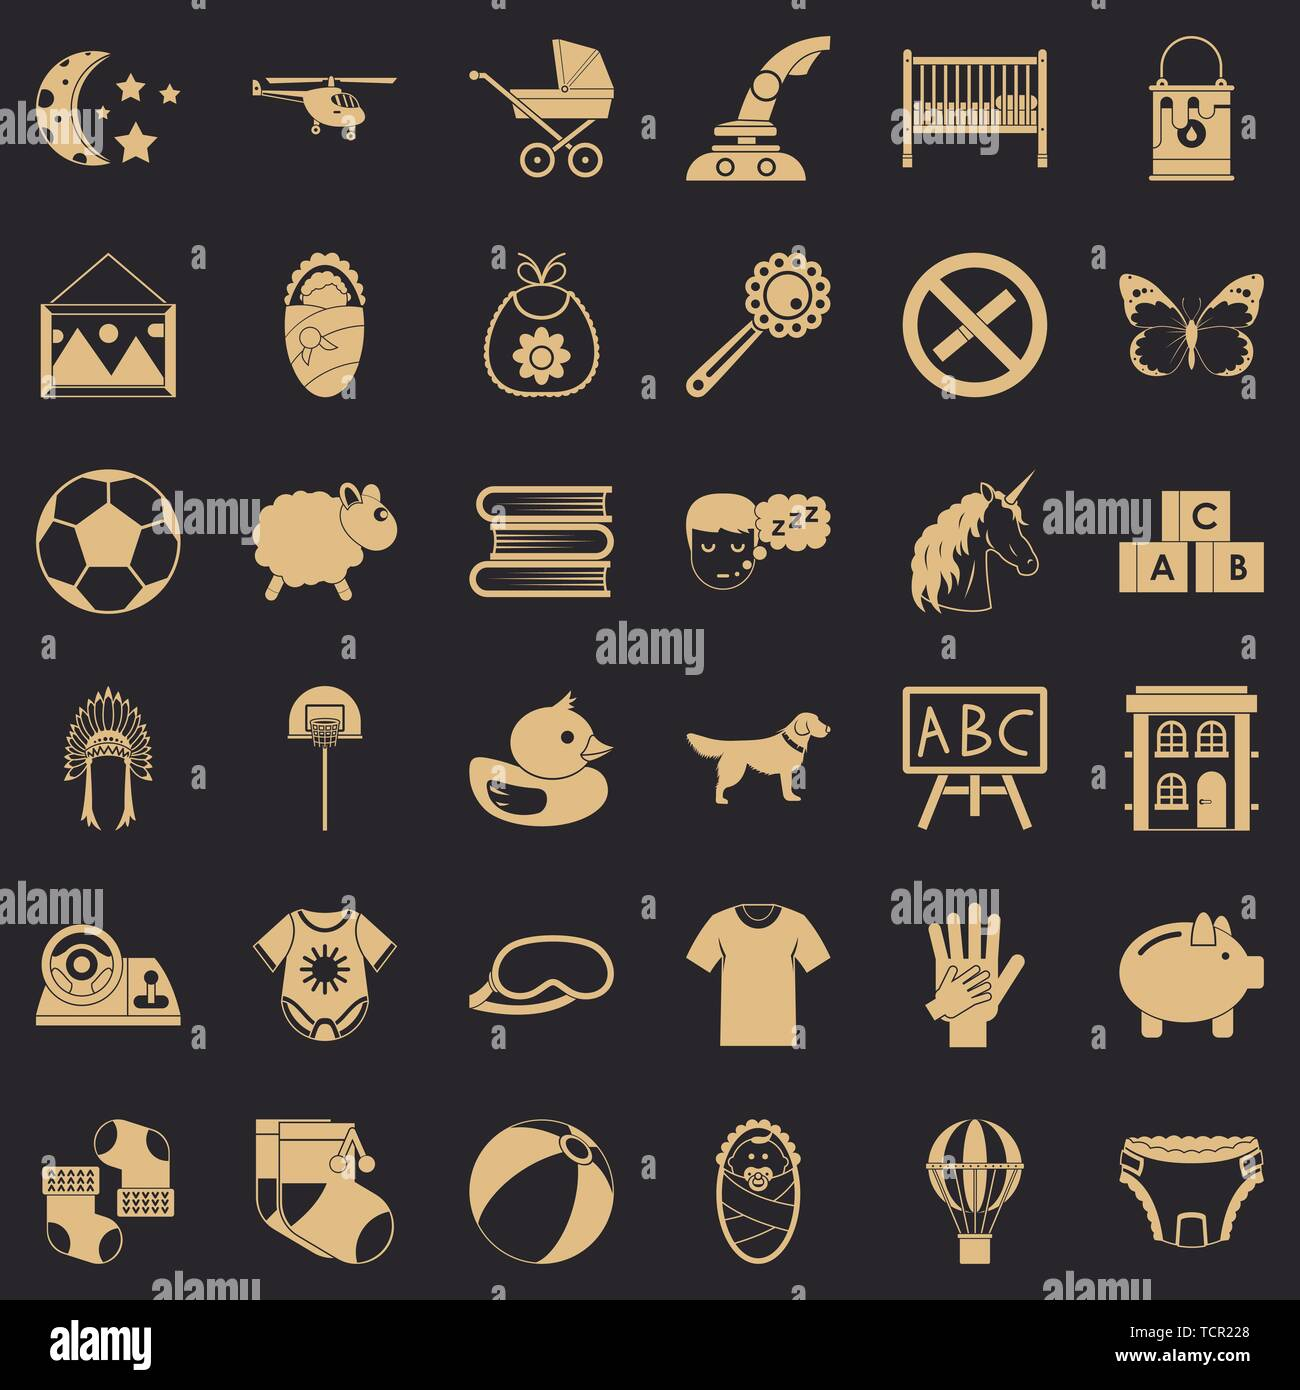 Minor icons set, simple style - Stock Image